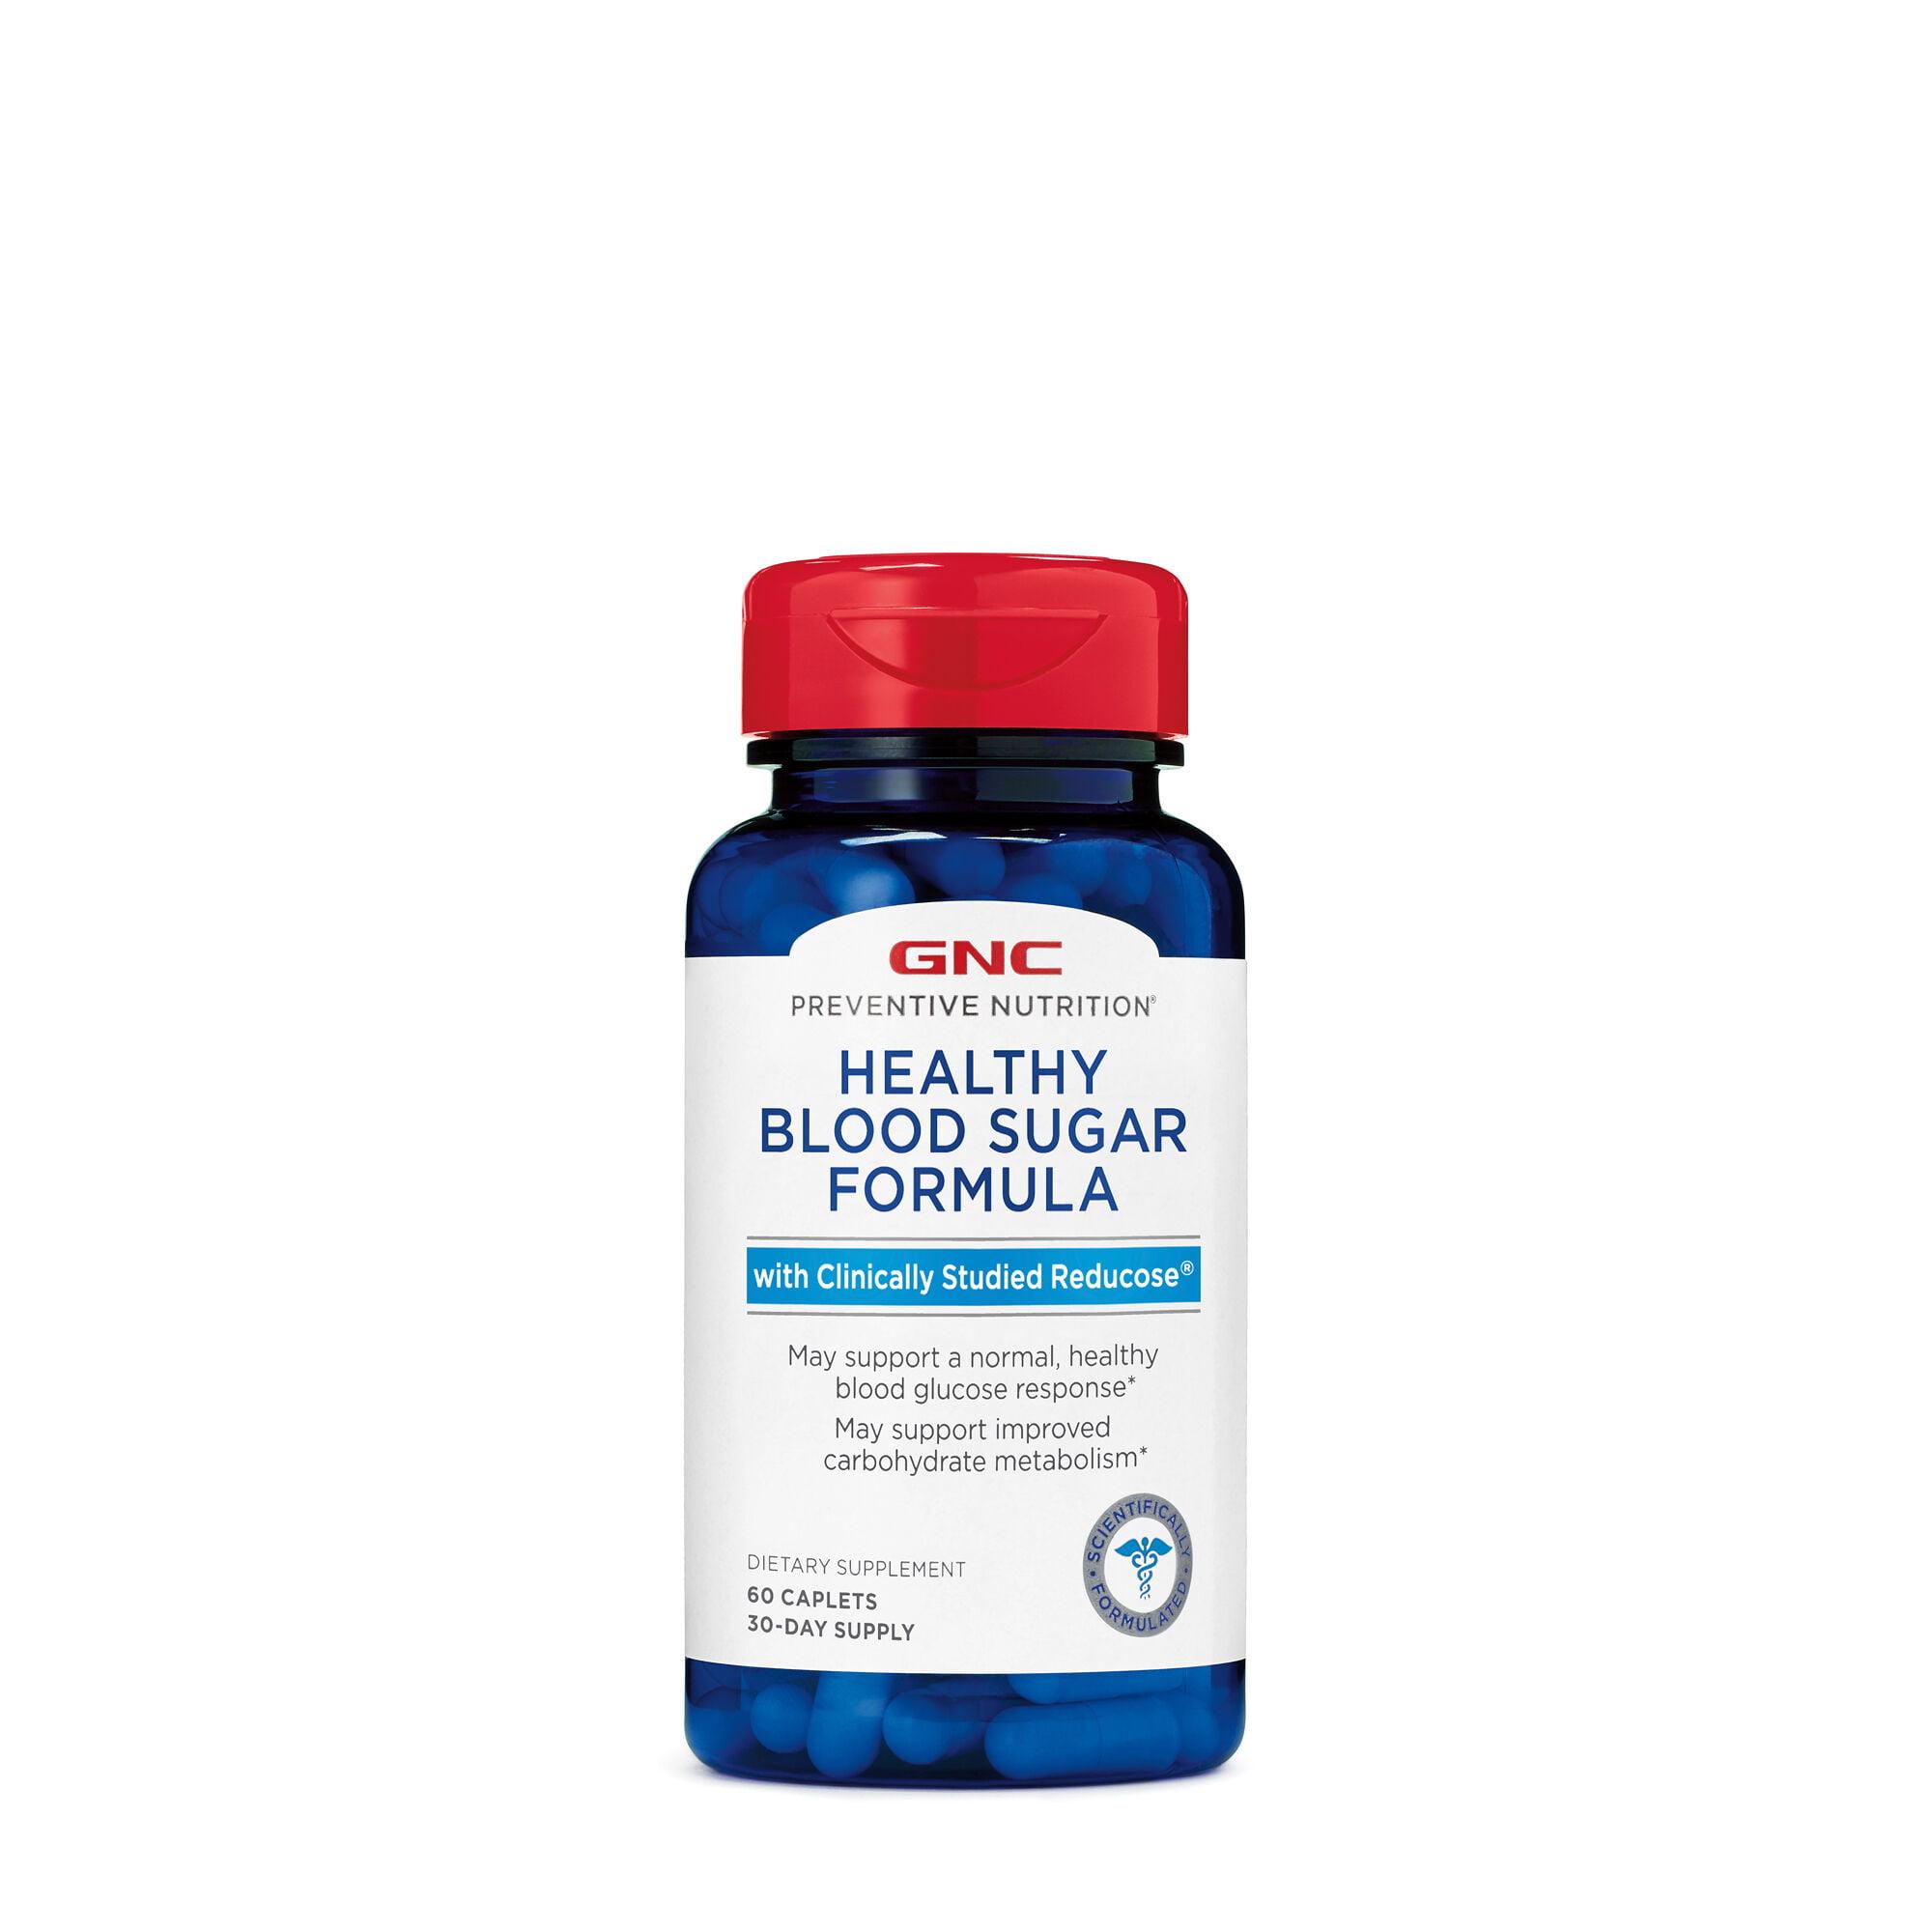 GNC Preventive Nutrition Healthy Blood Sugar Formula with ...